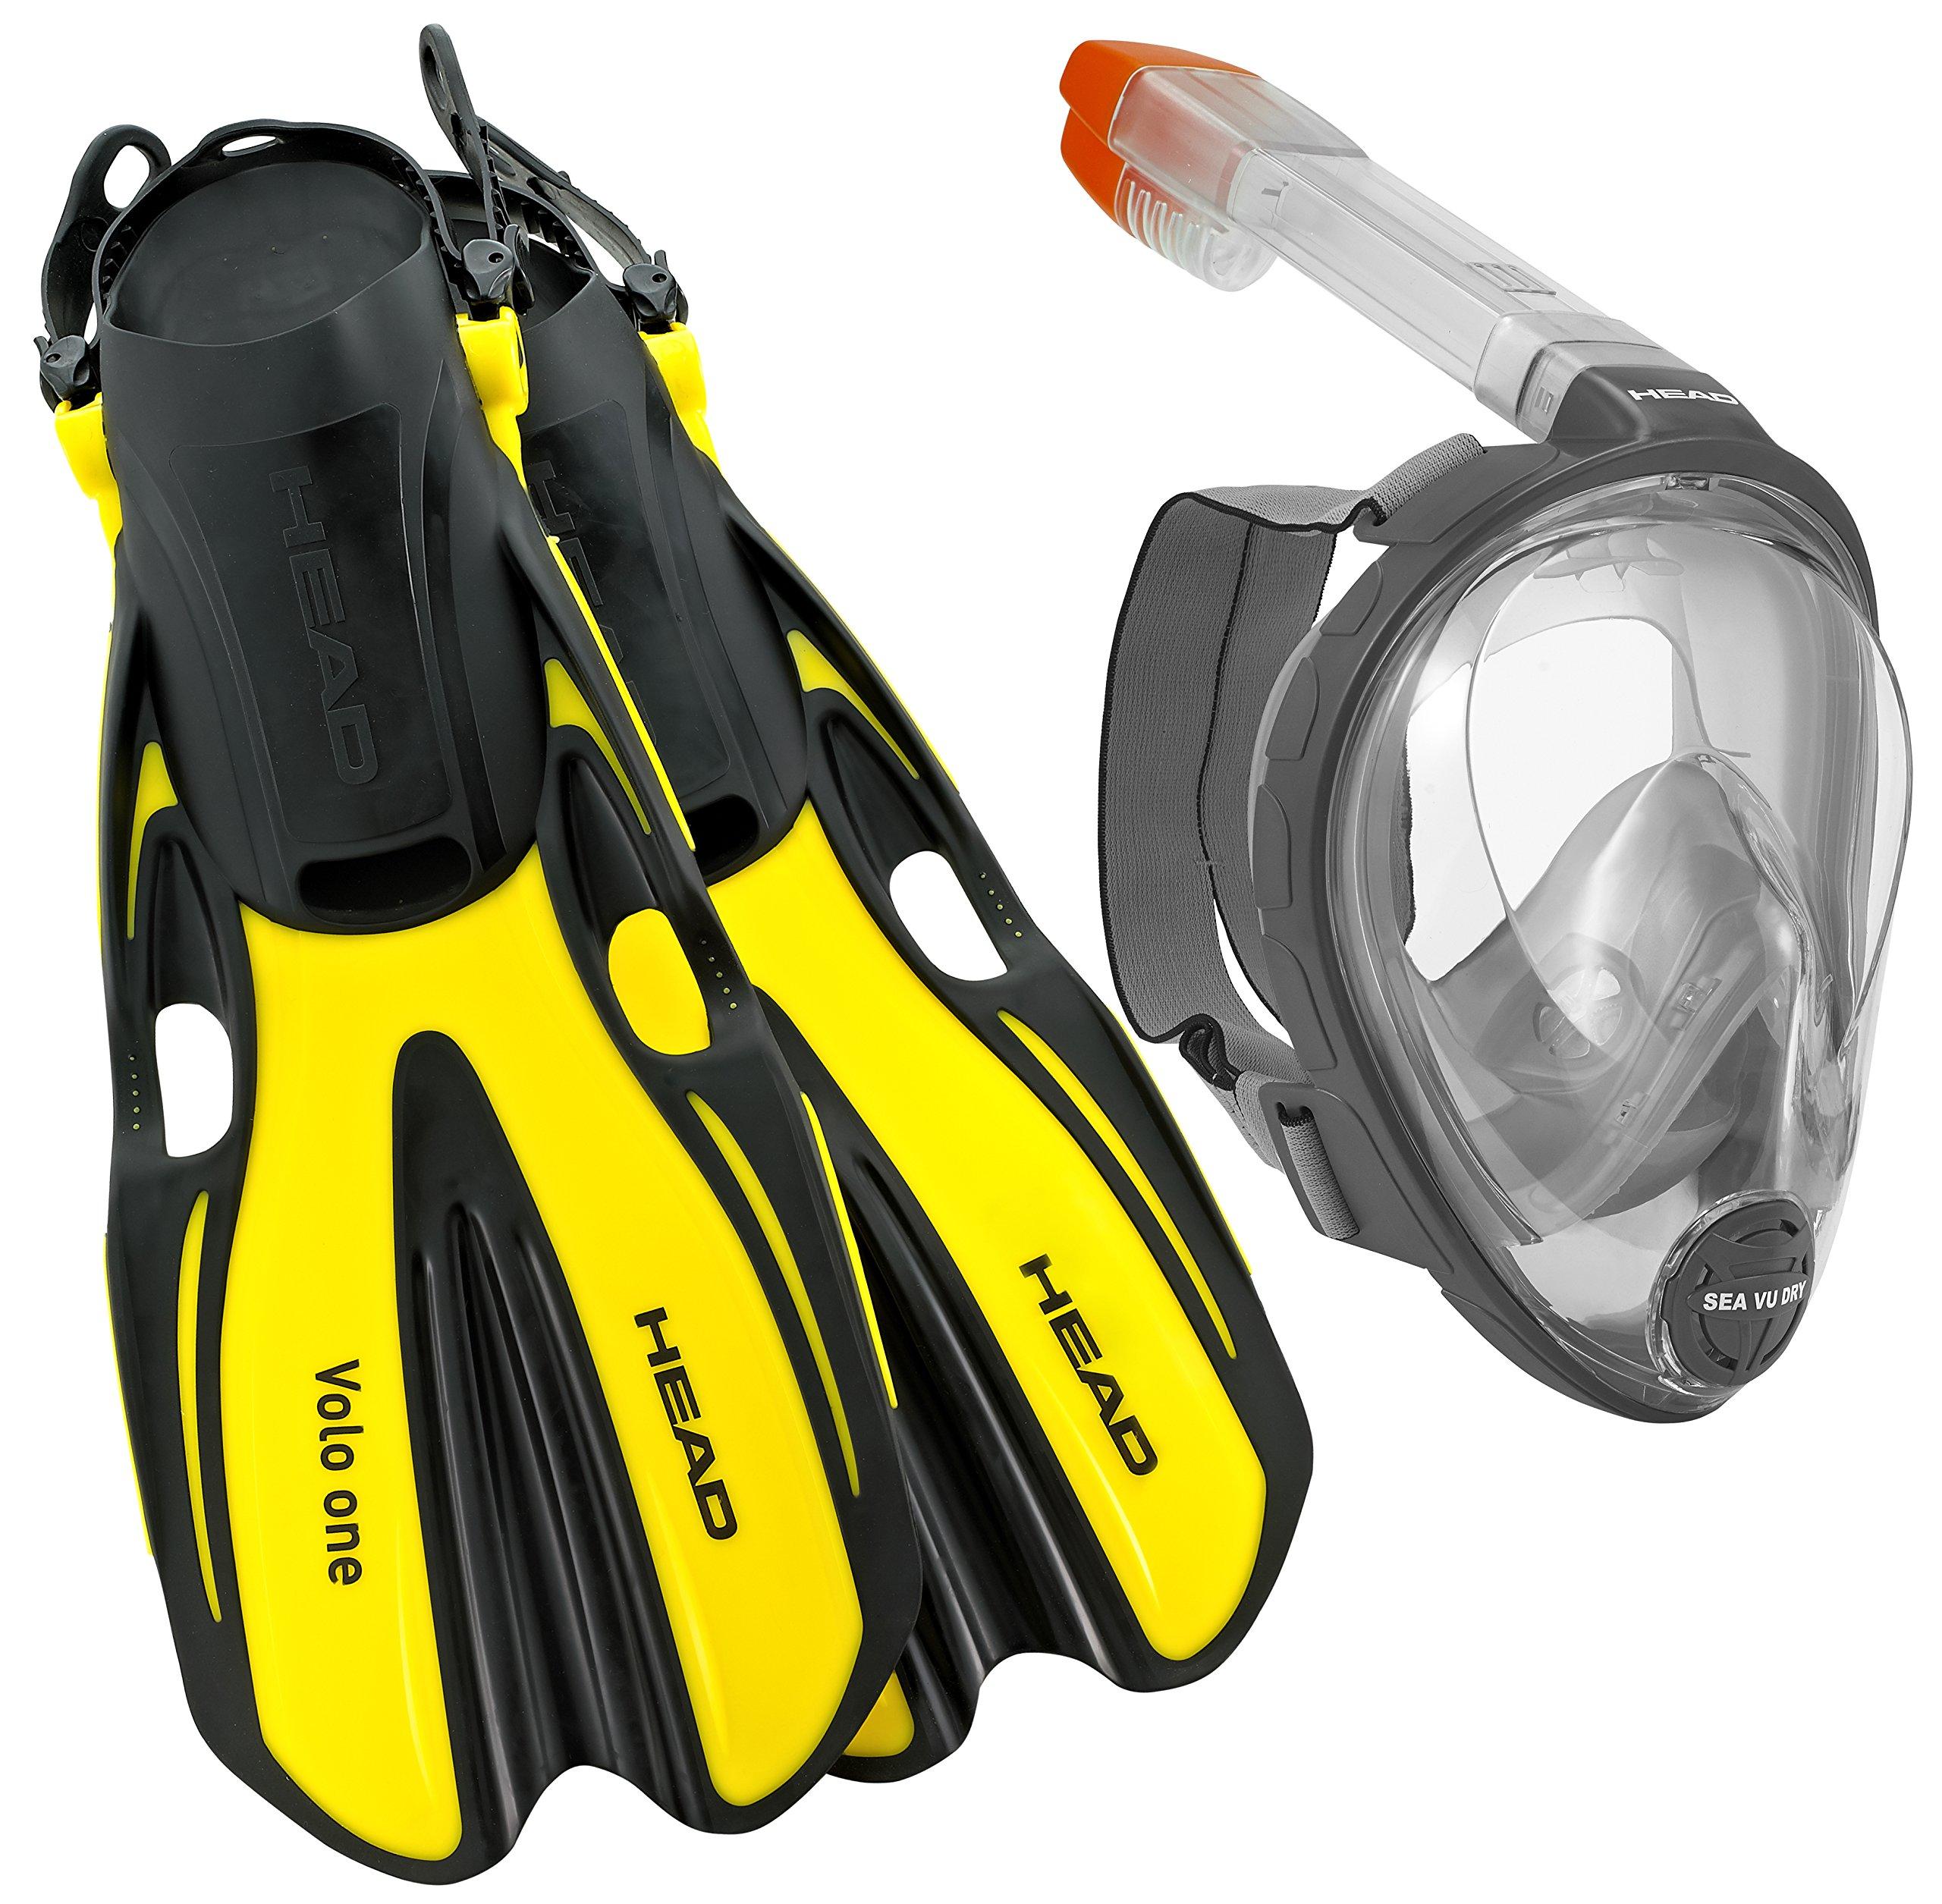 HEAD Sea View Dry Full Face Mask Fin Snorkel Set, Yellow, Small/Medium